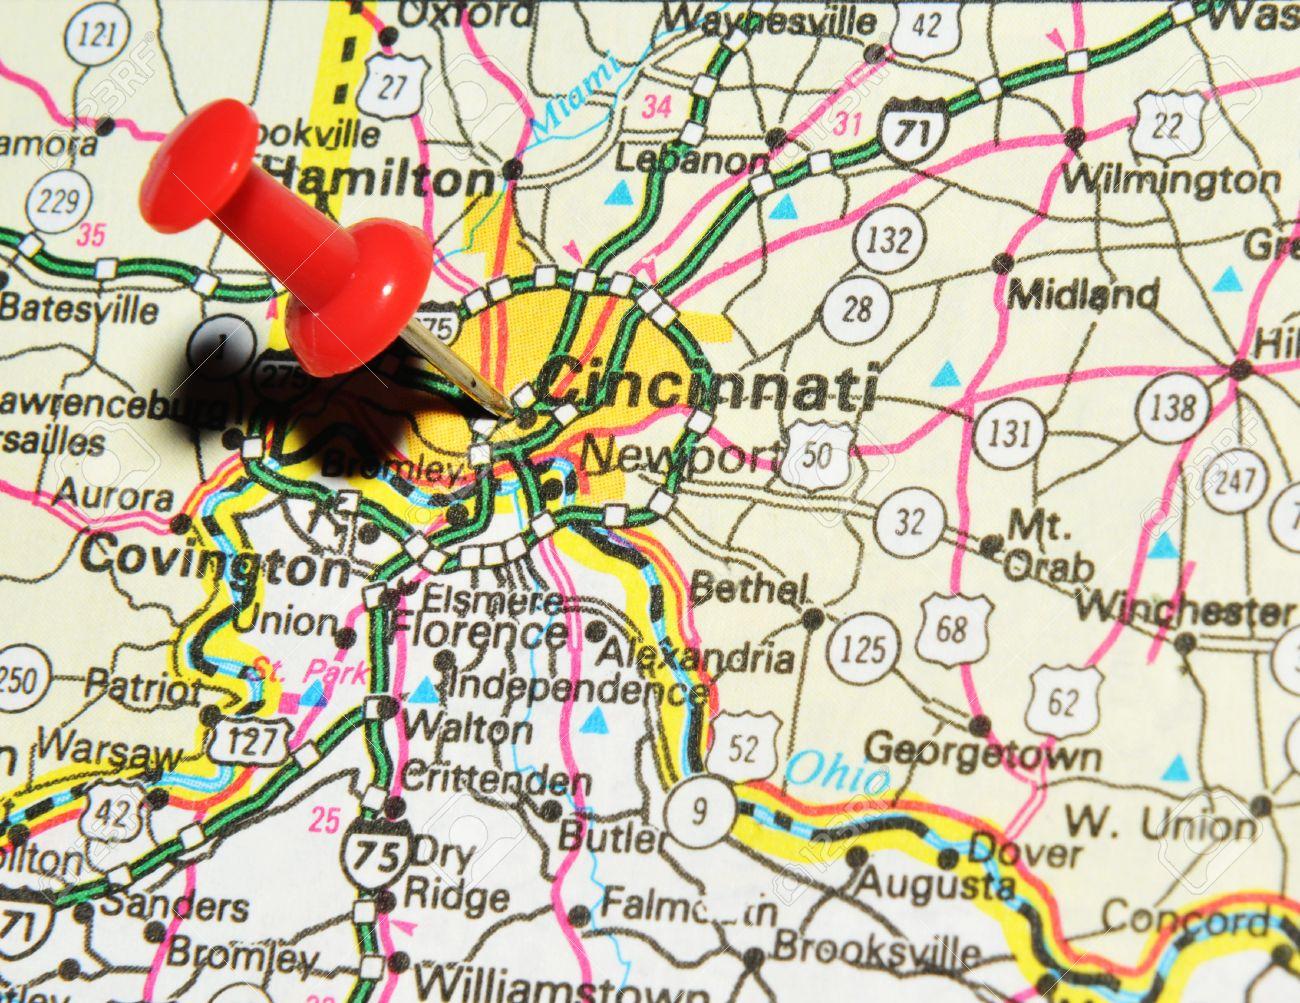 Us Map Cincinnati.London Uk 13 June 2012 Cincinnati City Marked With Red Pushpin